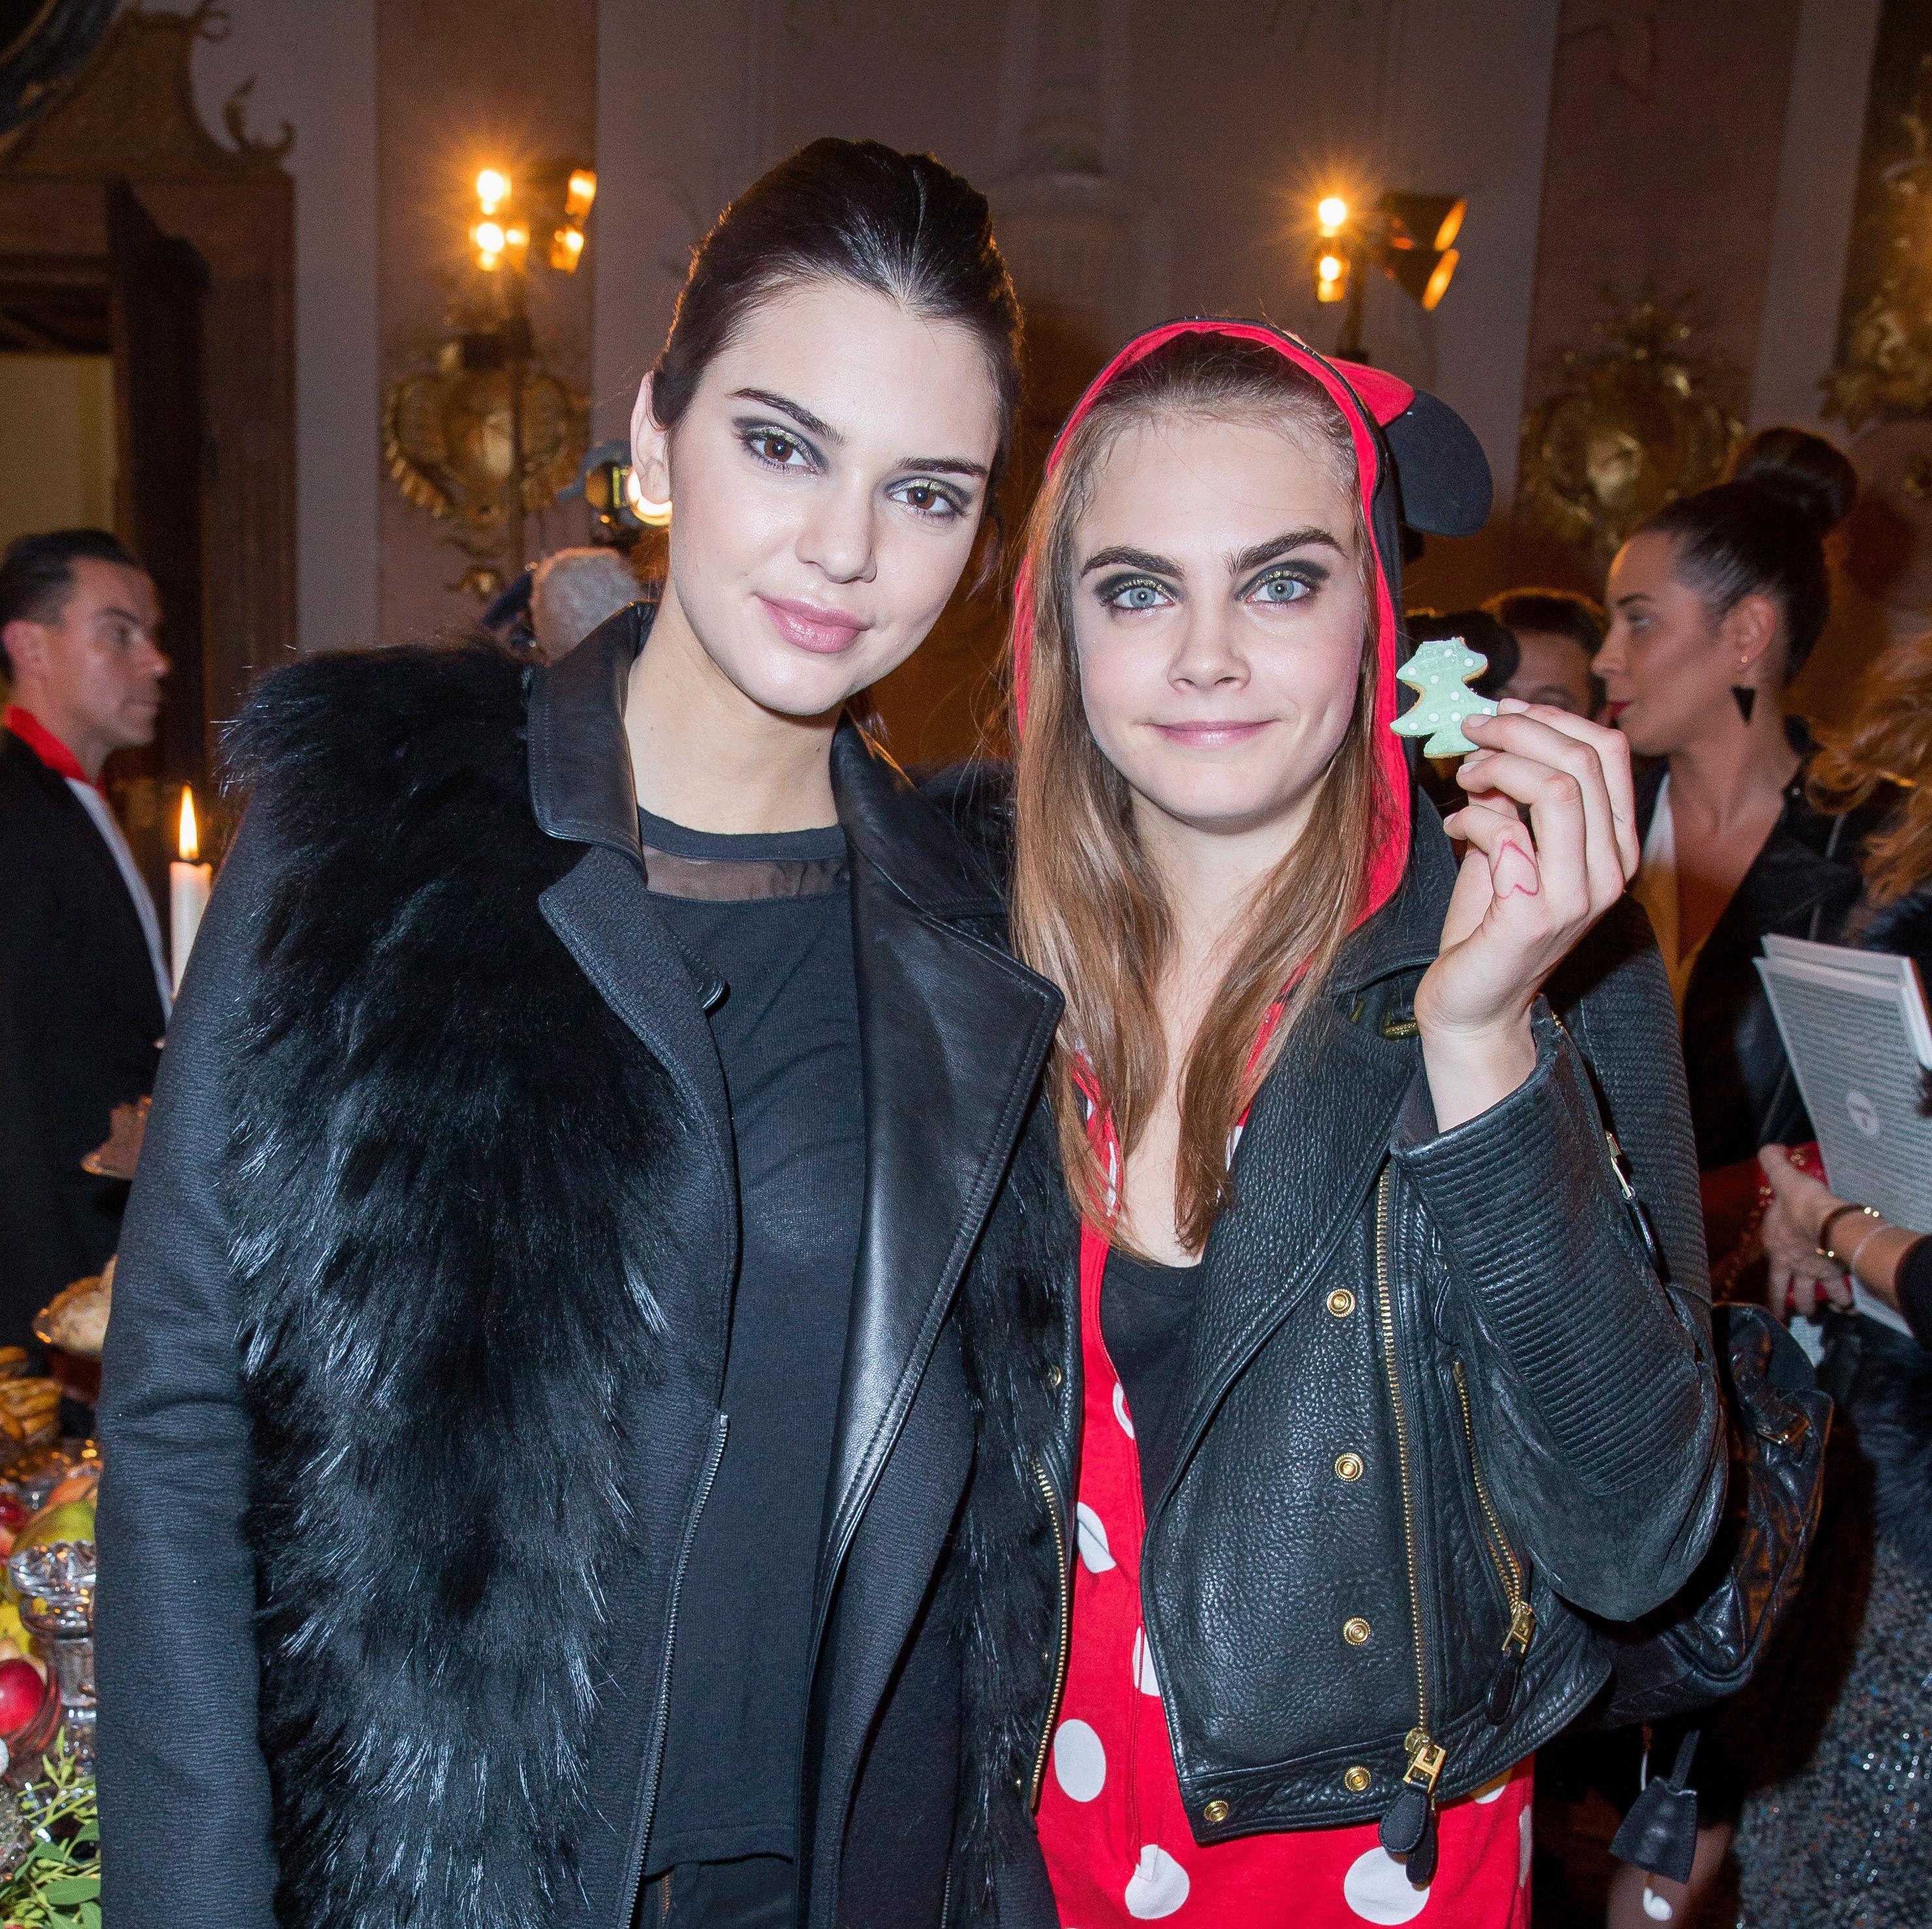 Cara and Kendall   Cara delevingne style, Cara delevingne